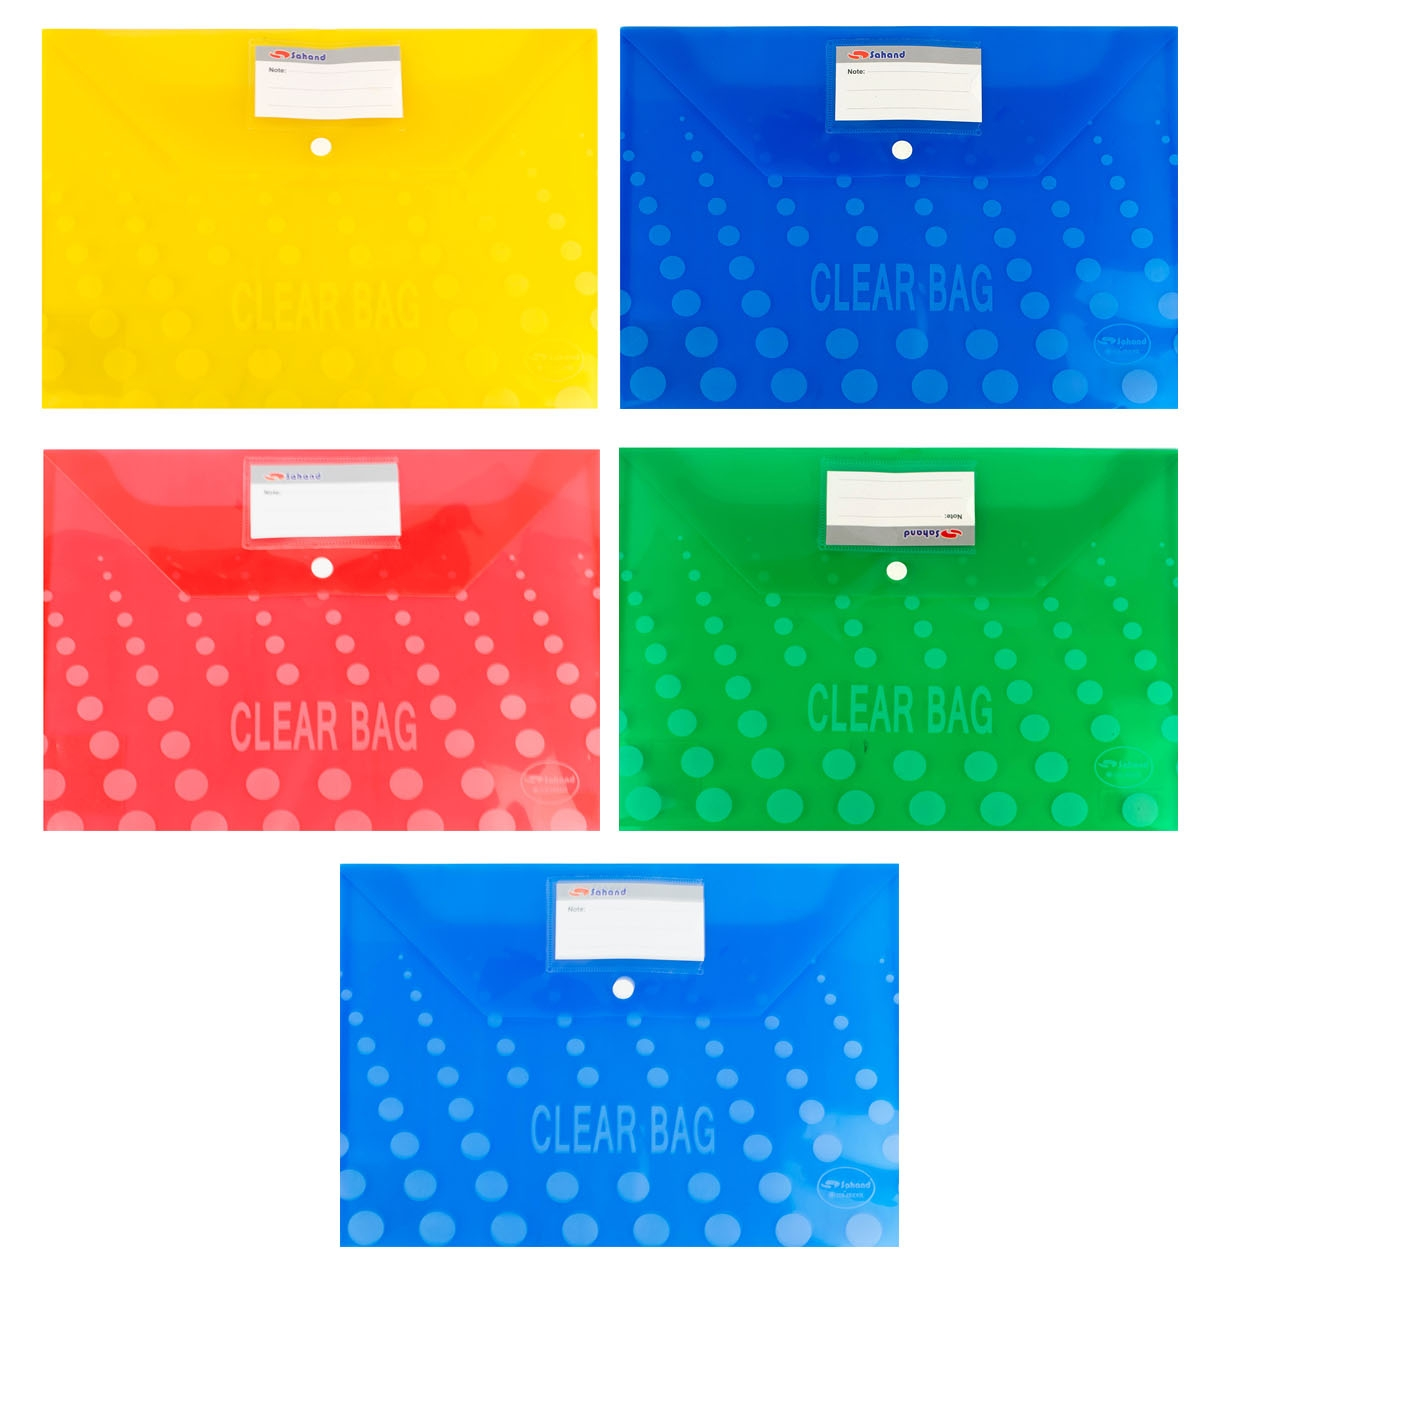 Папка-конверт А4 на кнопке Alingar Clear Bag прозр красная 150мкм карм